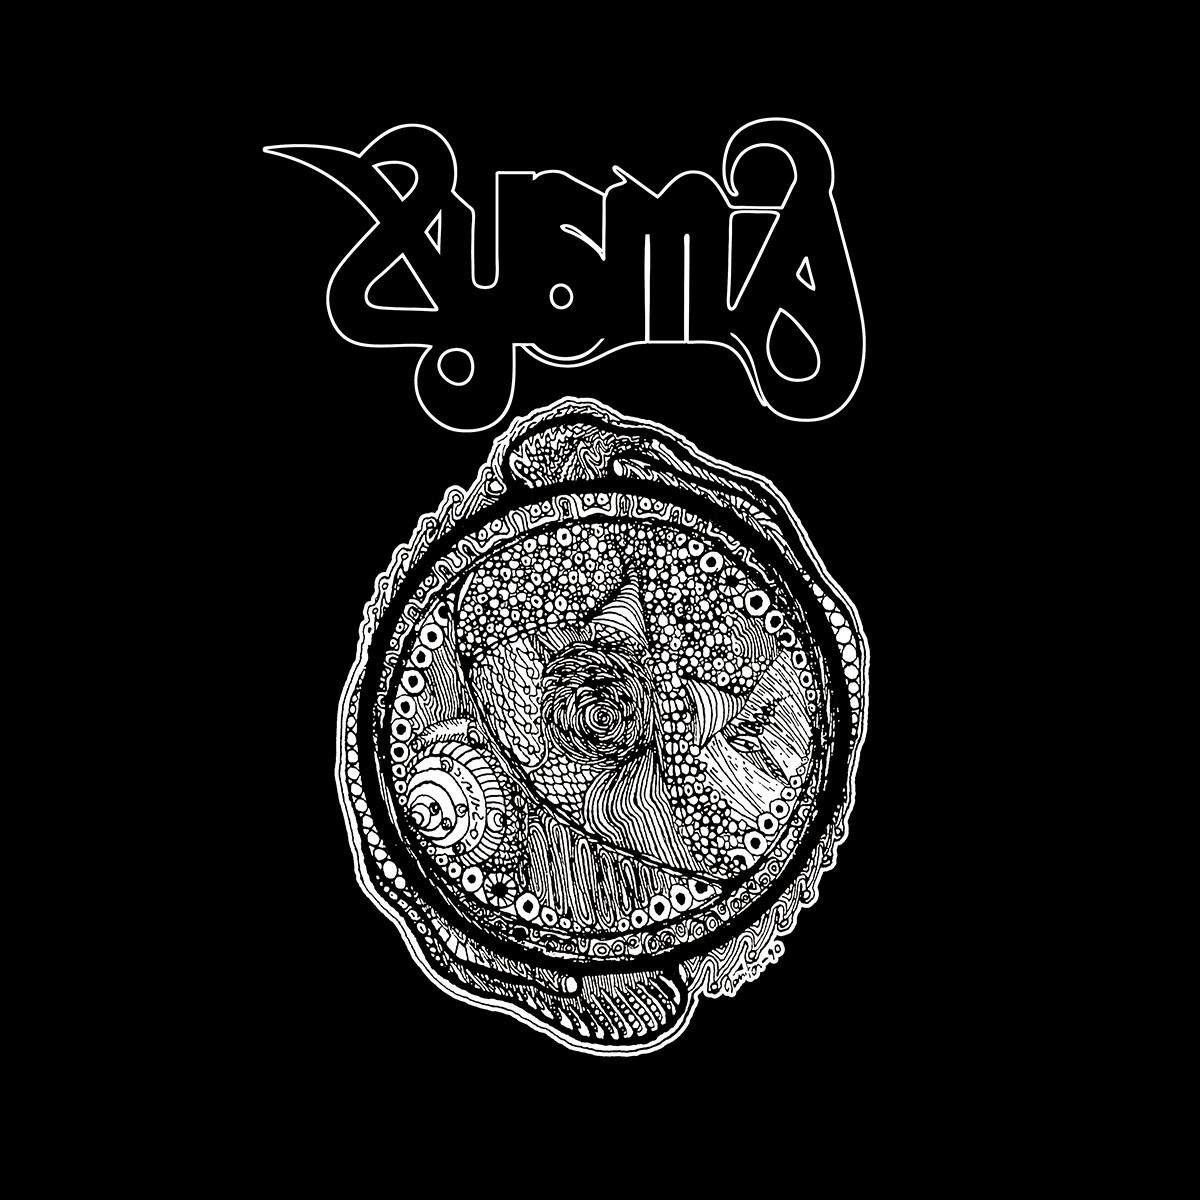 XYSMA - Repulsive Morbidity: A Boxful of Foetal Mush 1988-1991